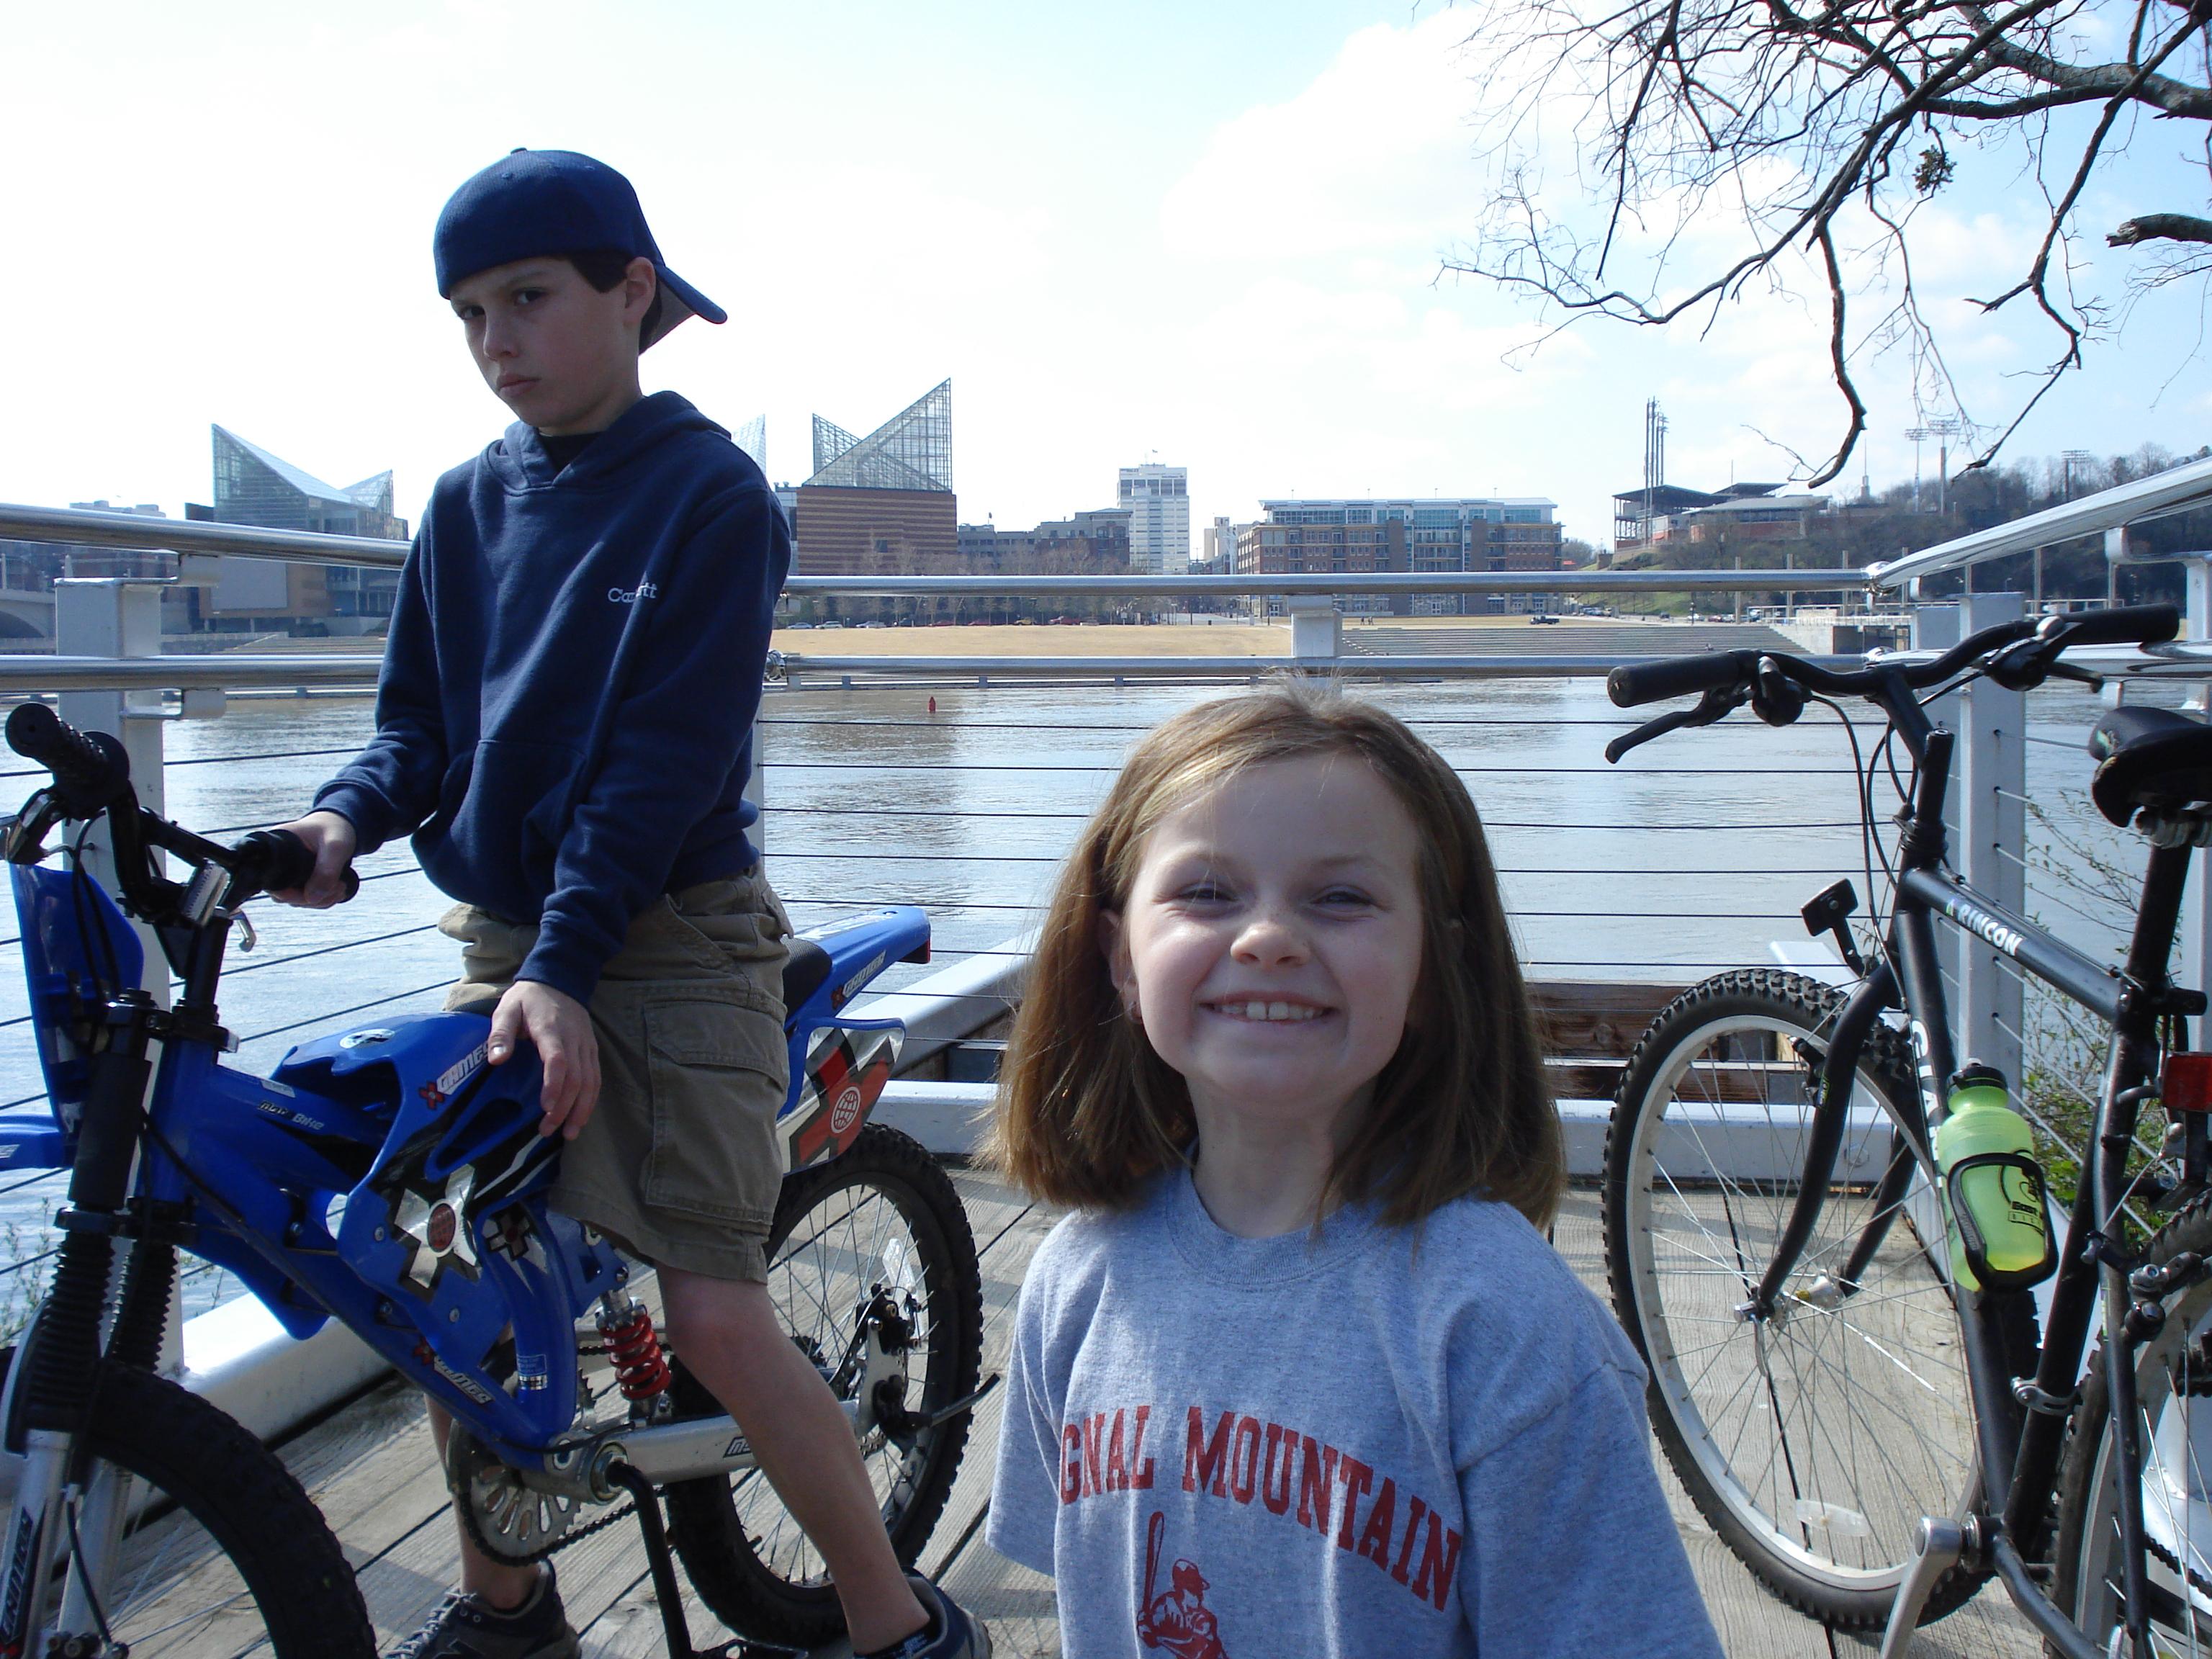 Biking on the River